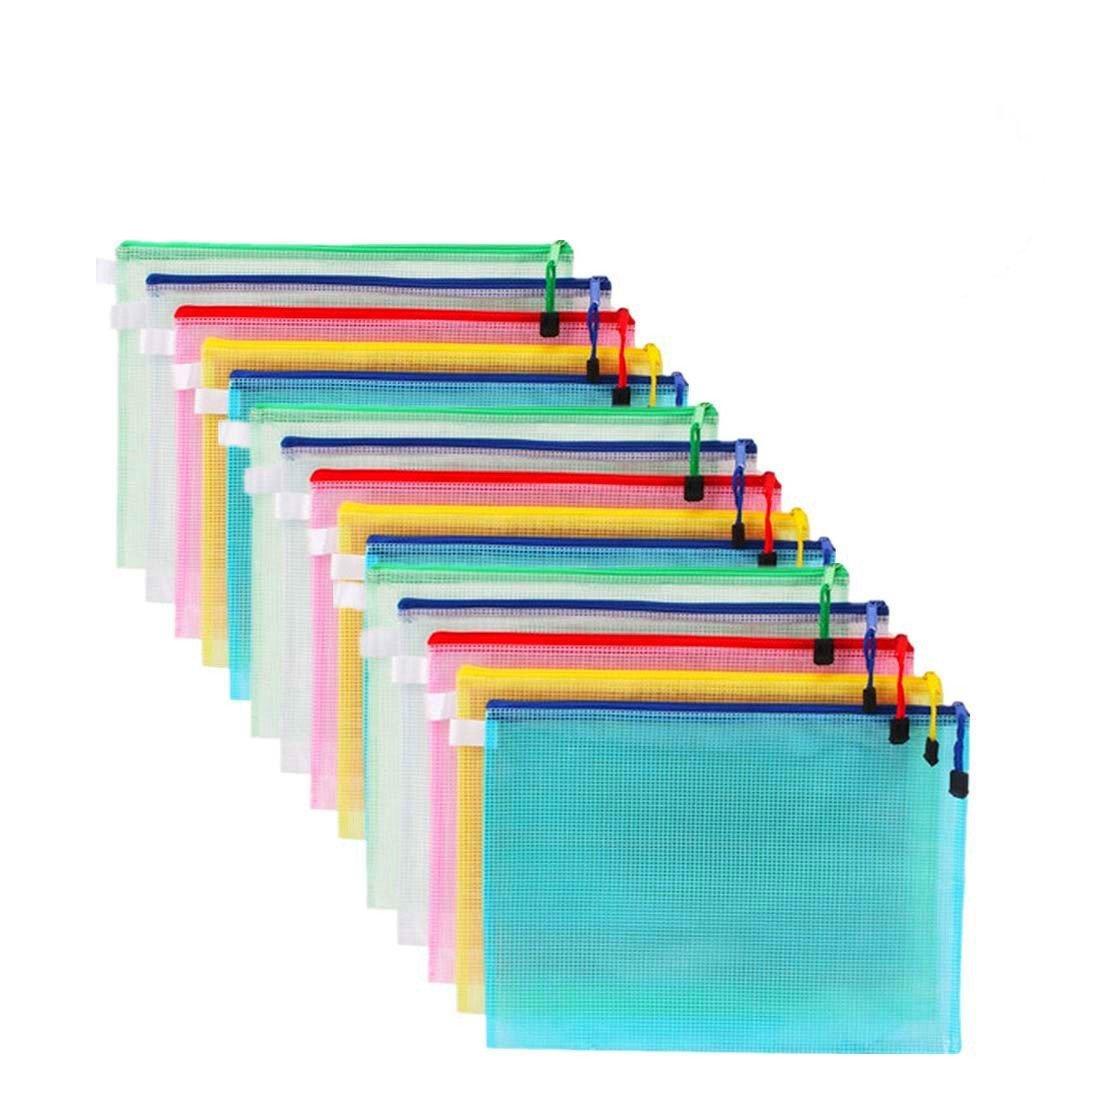 15 Pcs A4 Plastic Mesh Zip File Folder 5 Colors PVC Organizer Storage Bags Waterproof Bags for Office Supplies, Travel Storage Bags